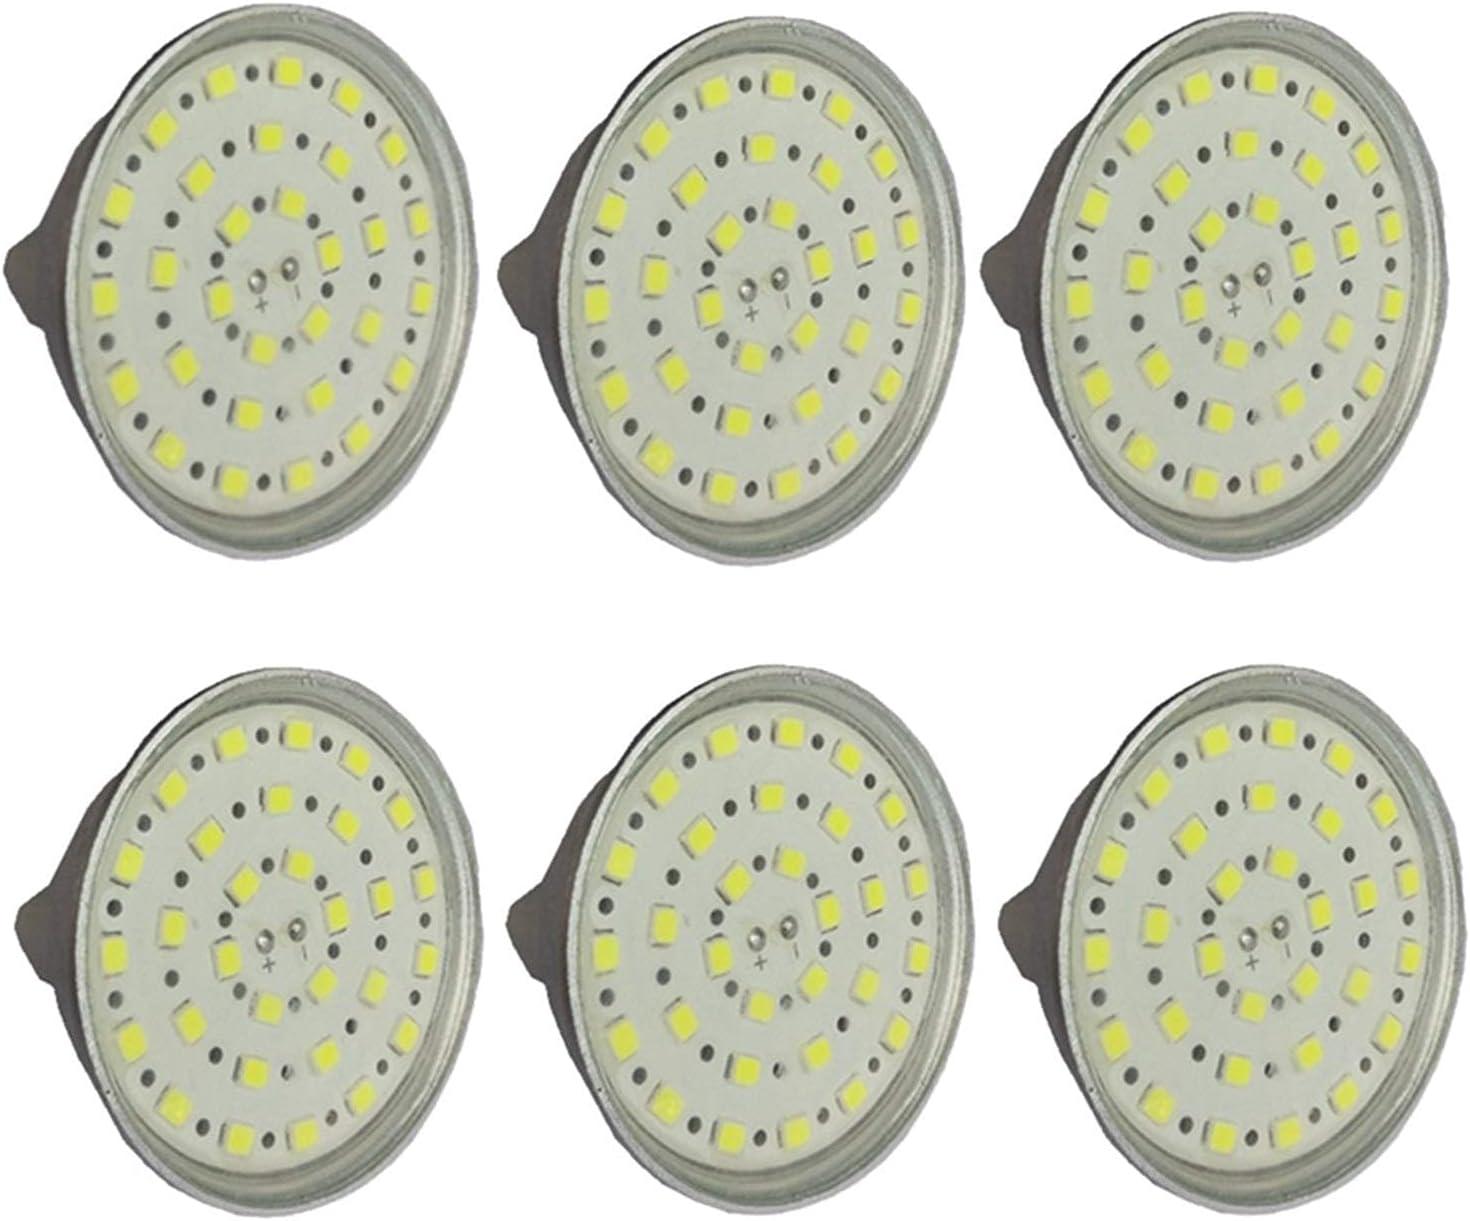 YQGOO MR16 5W Bombillas LED para focos 24V, 36V GU5.3 Bombillas LED, Equivalentes a 50W de halógeno, AC/DC 24-40V, 6W 450-500LM, No Regulable, con Cubierta de Vidrio Transparente Paquete de 6